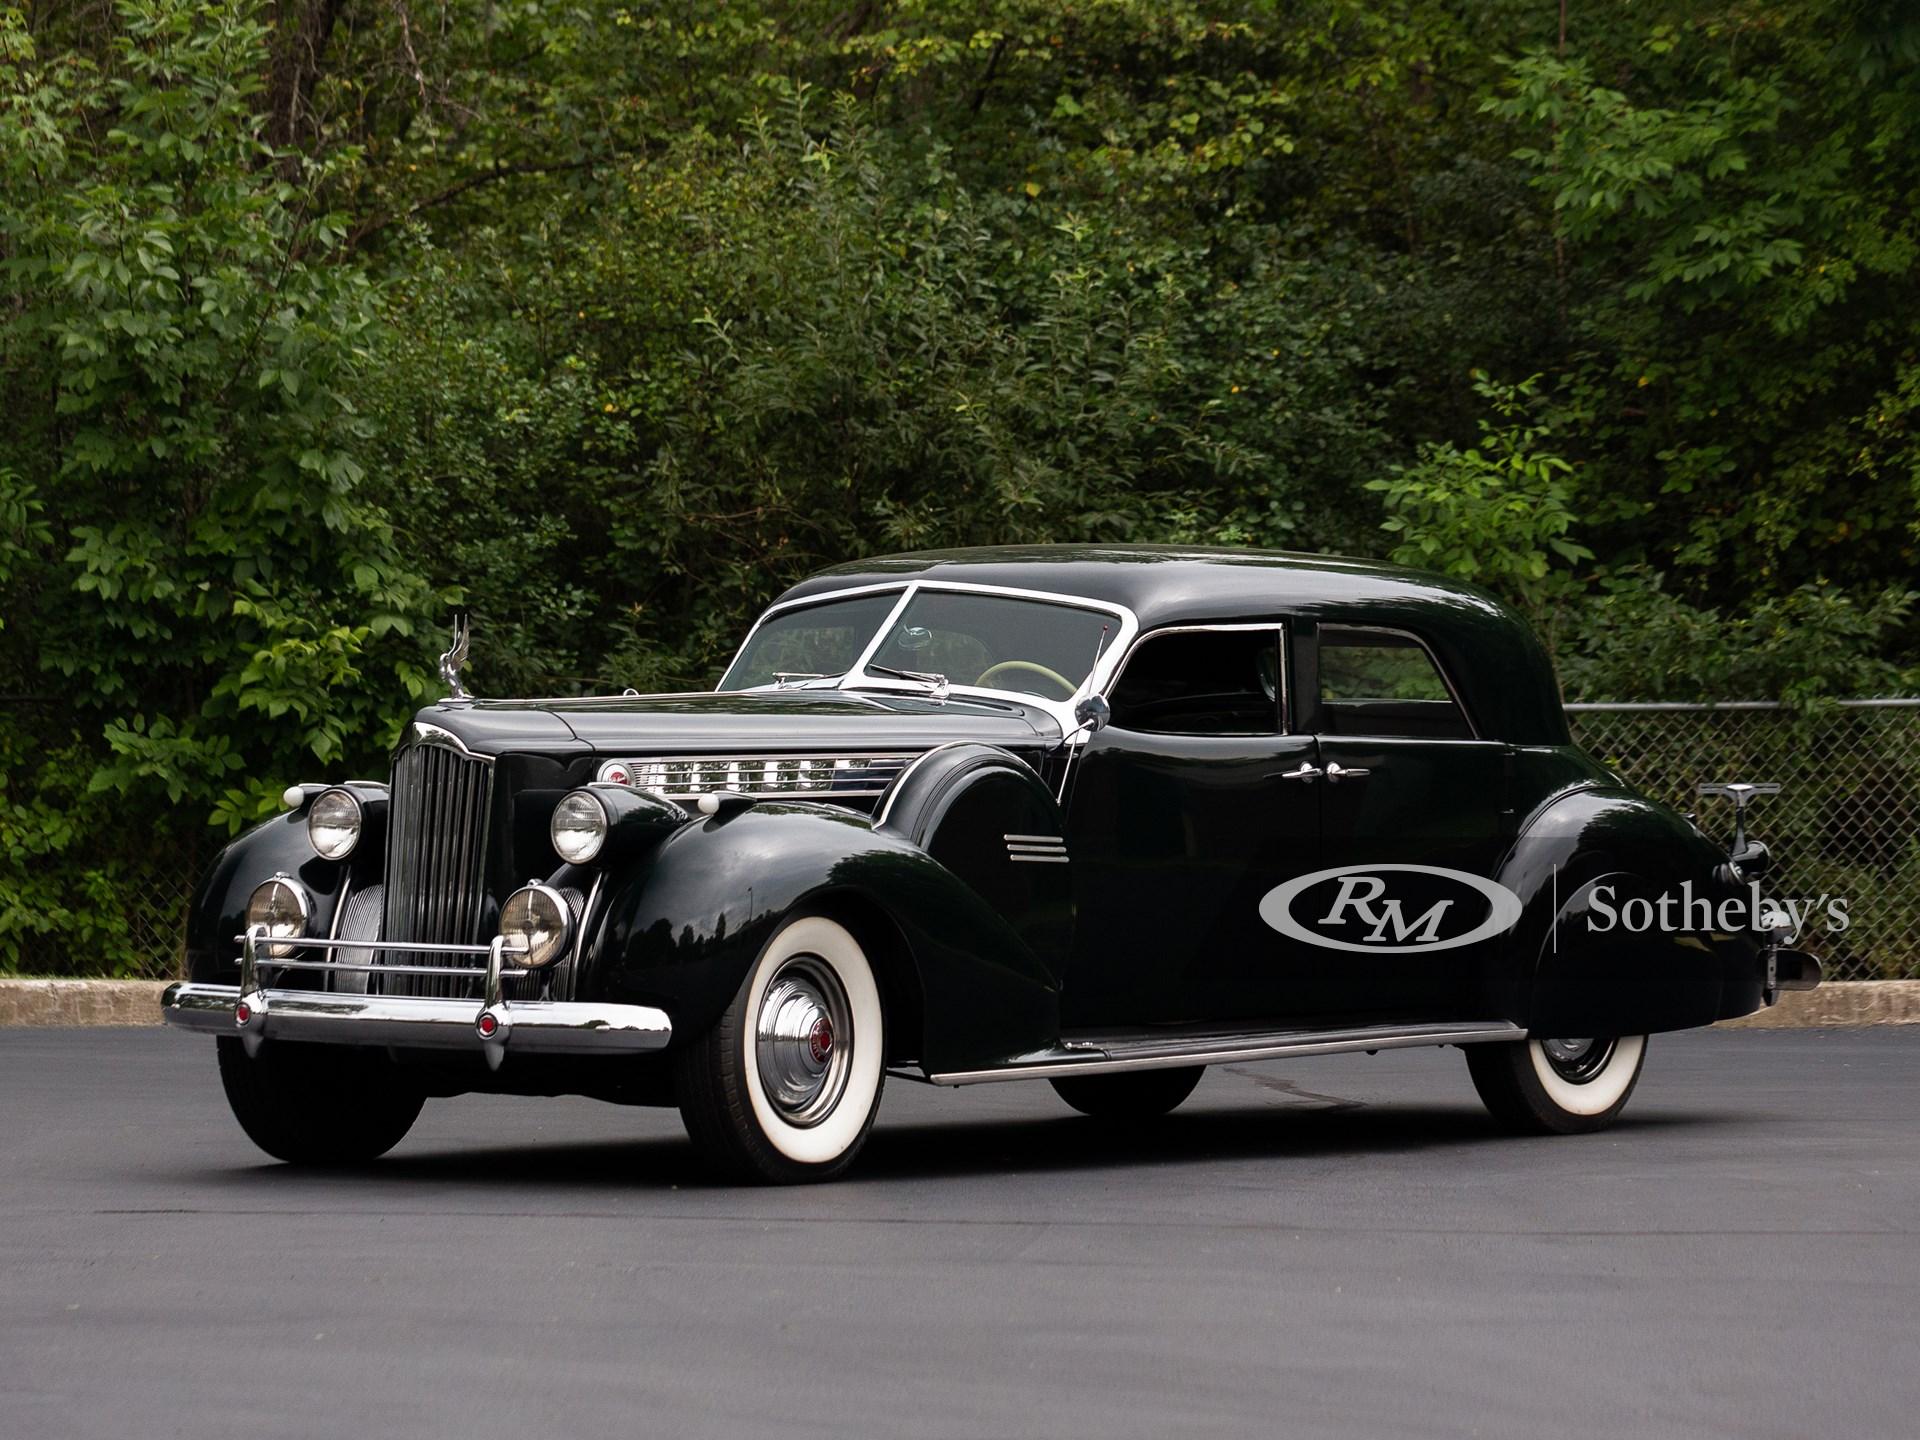 1940 Packard Custom Super Eight One Eighty Sport Sedan by Darrin (Drew Shipley ©2021 Courtesy of RM Sotheby's)